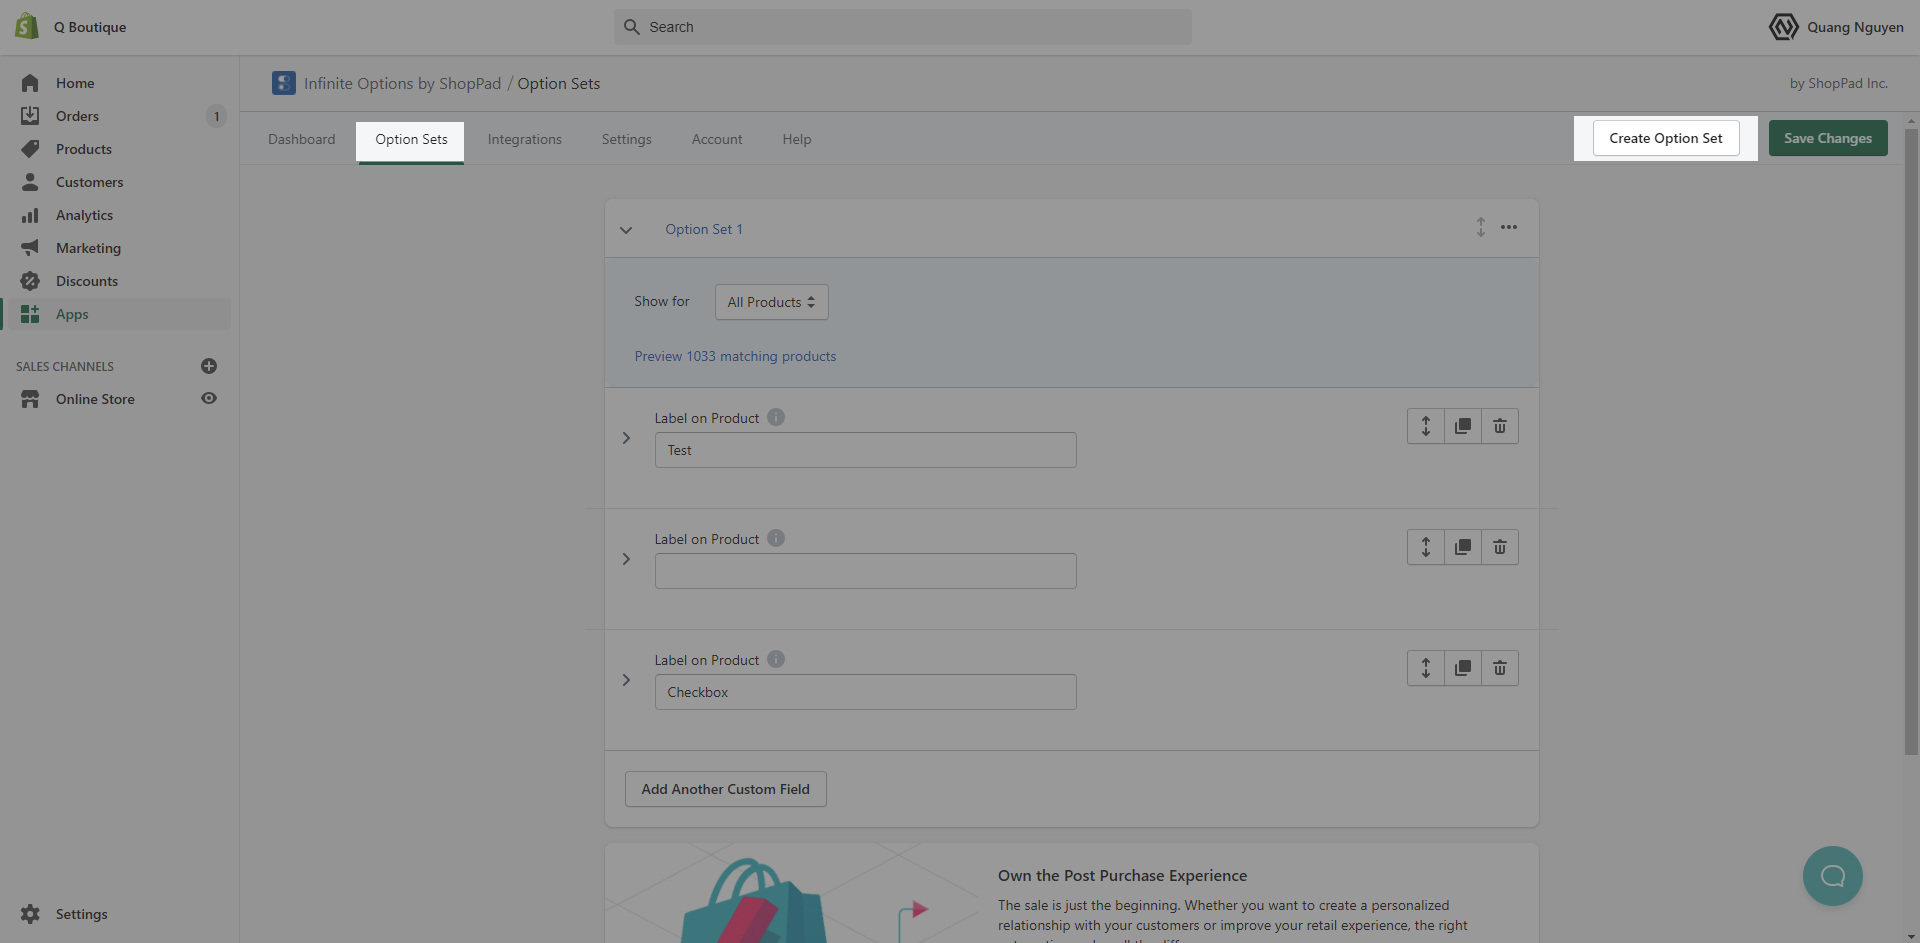 Configure Infinite Options by ShopPad